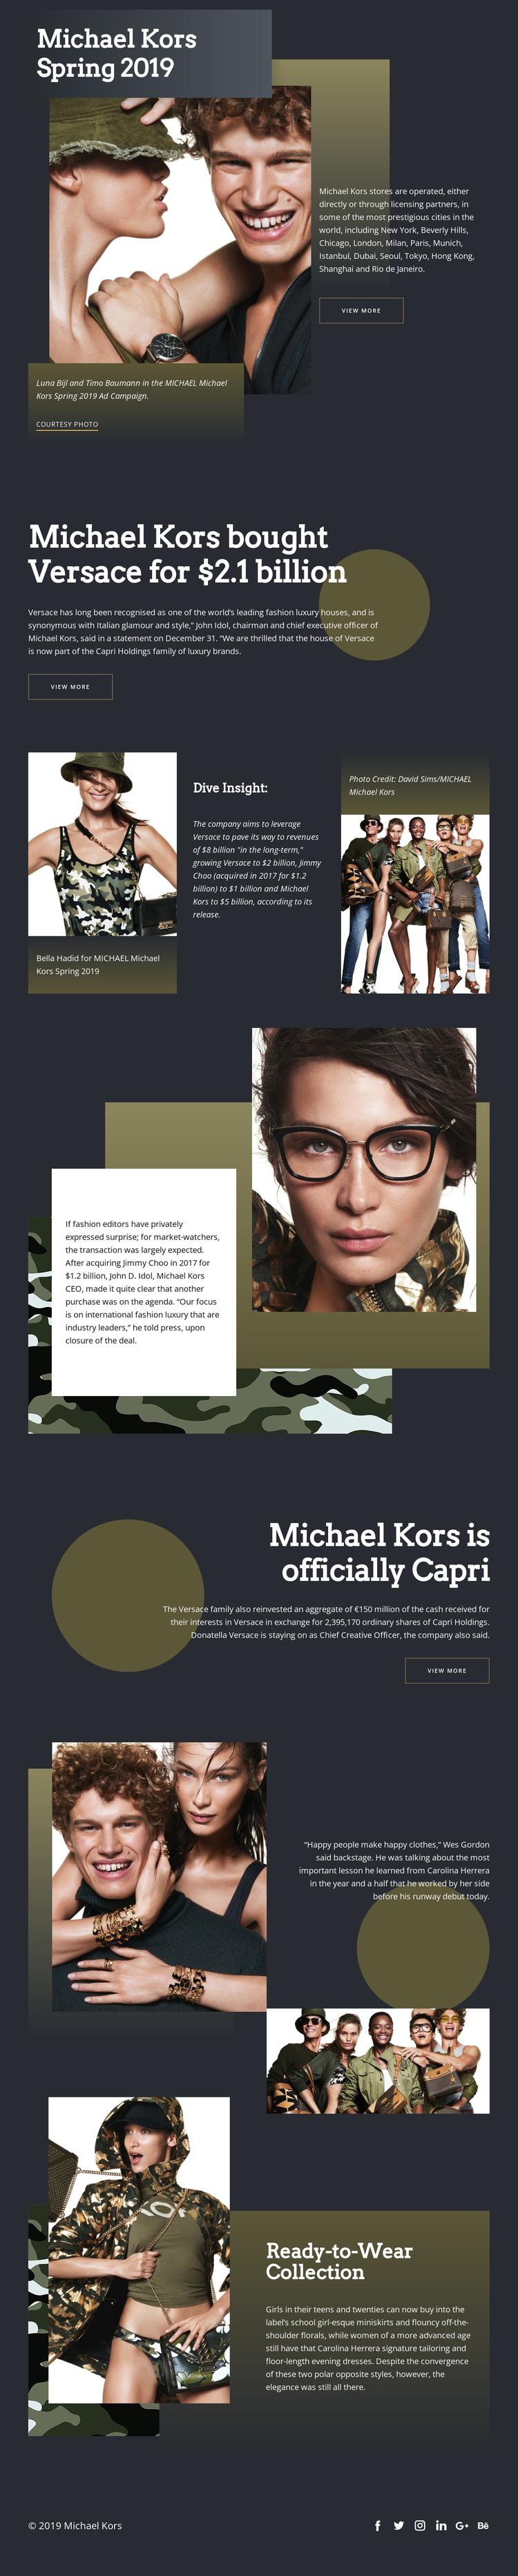 Michael Kors Dark HTML Template